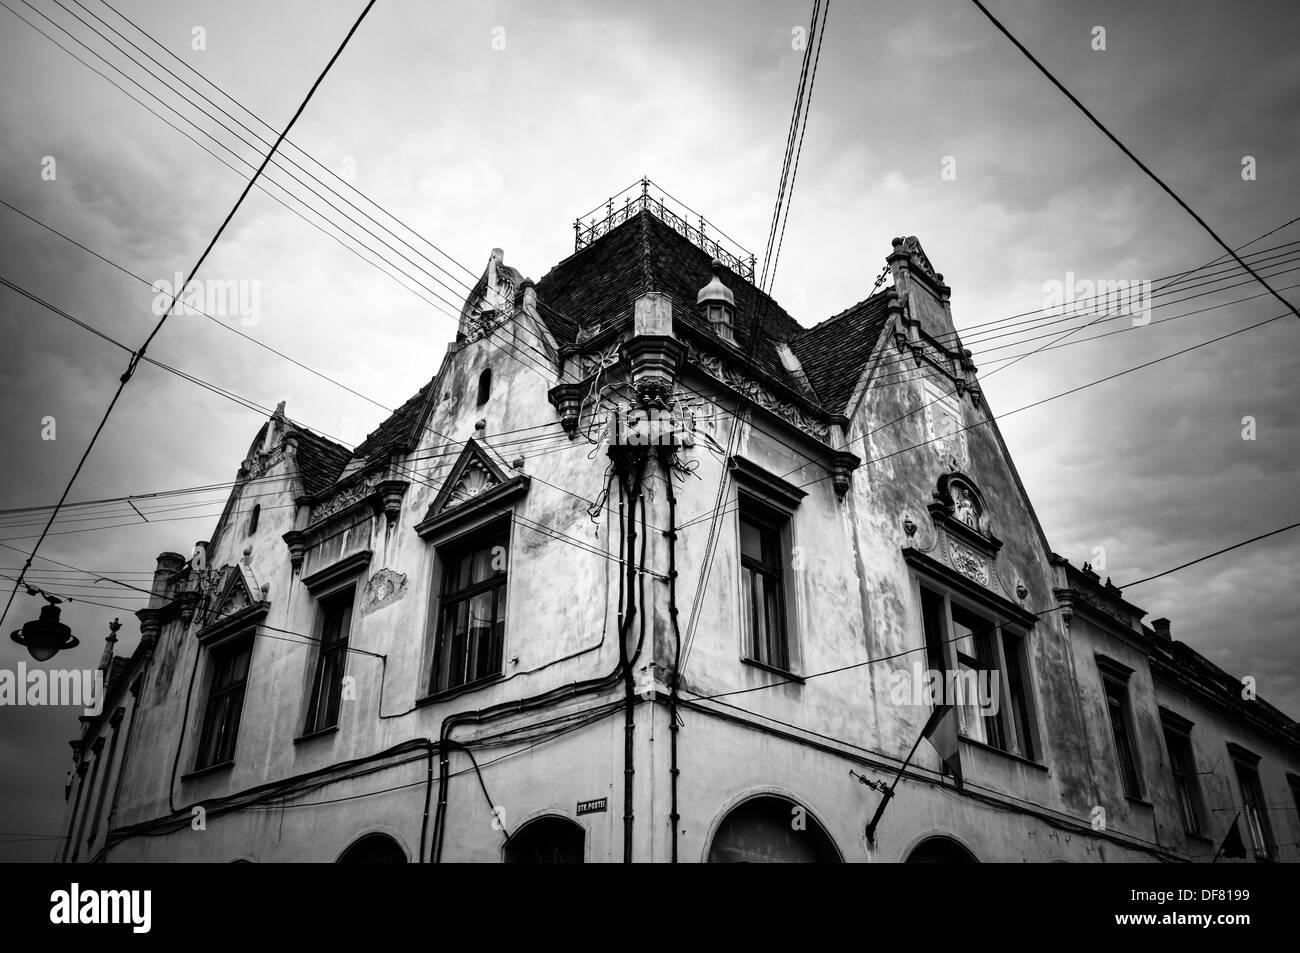 Romania, Bucharest building - Stock Image